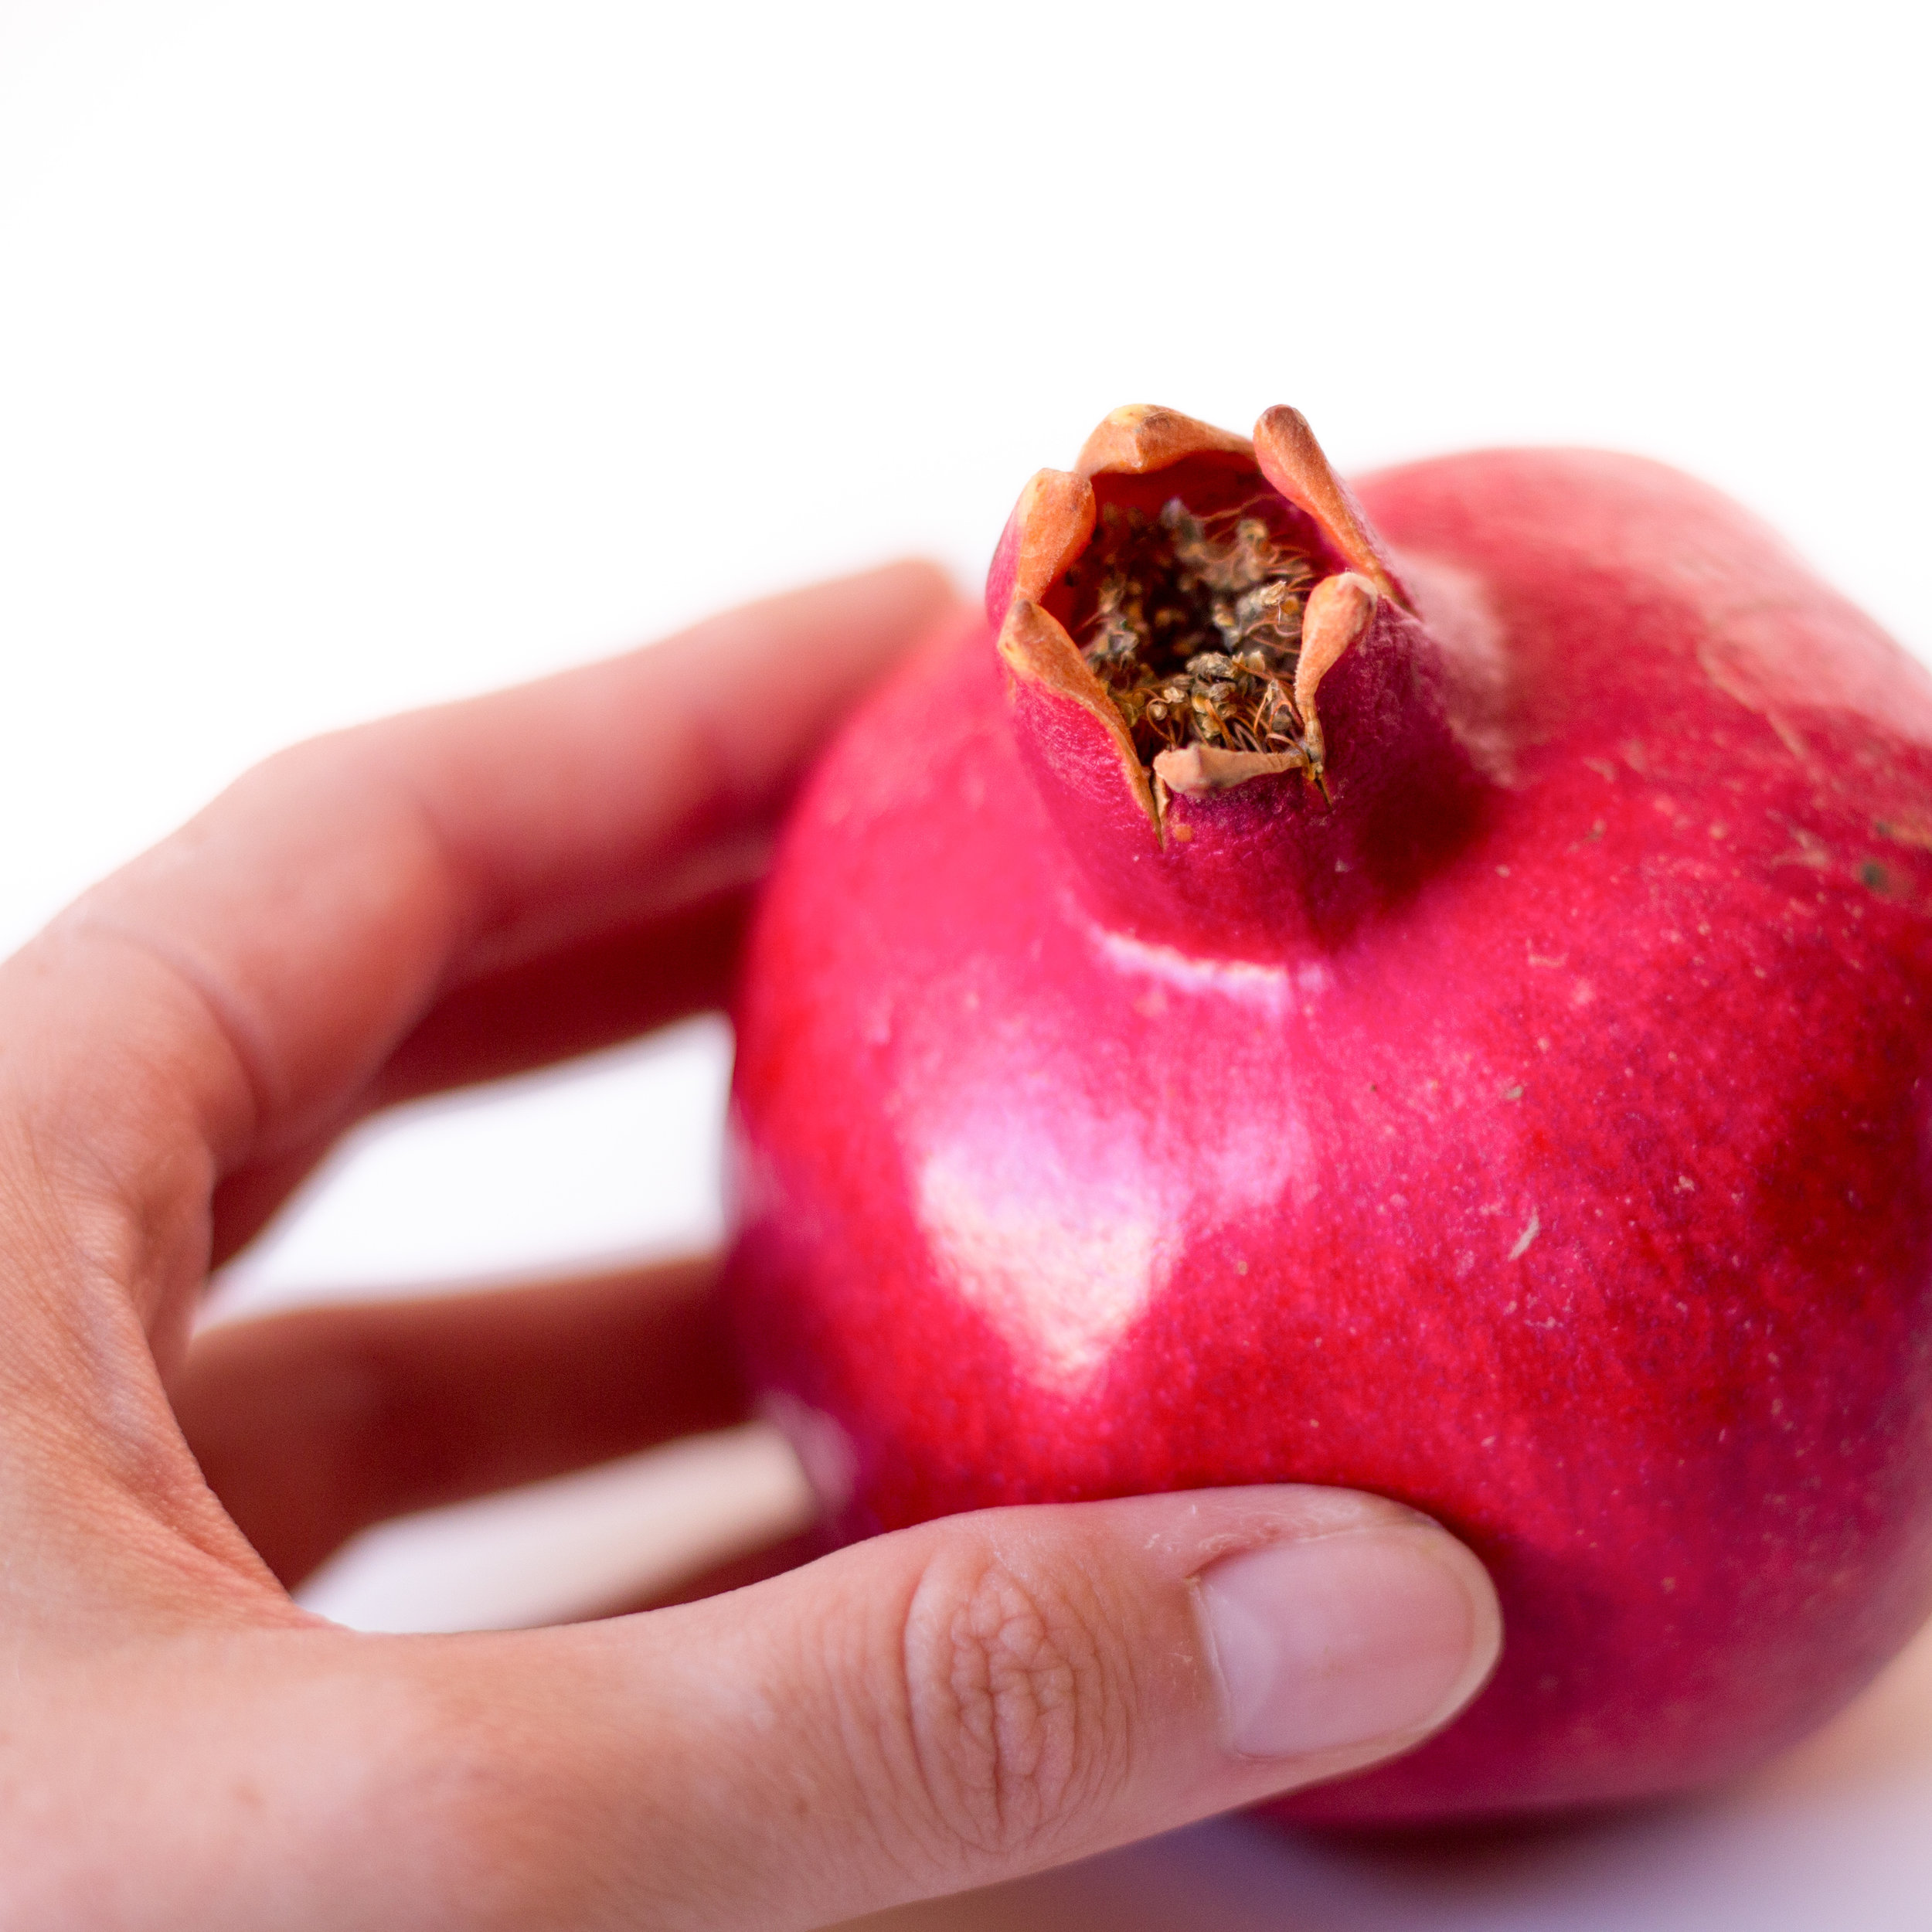 Hand and Pomegranate.jpg